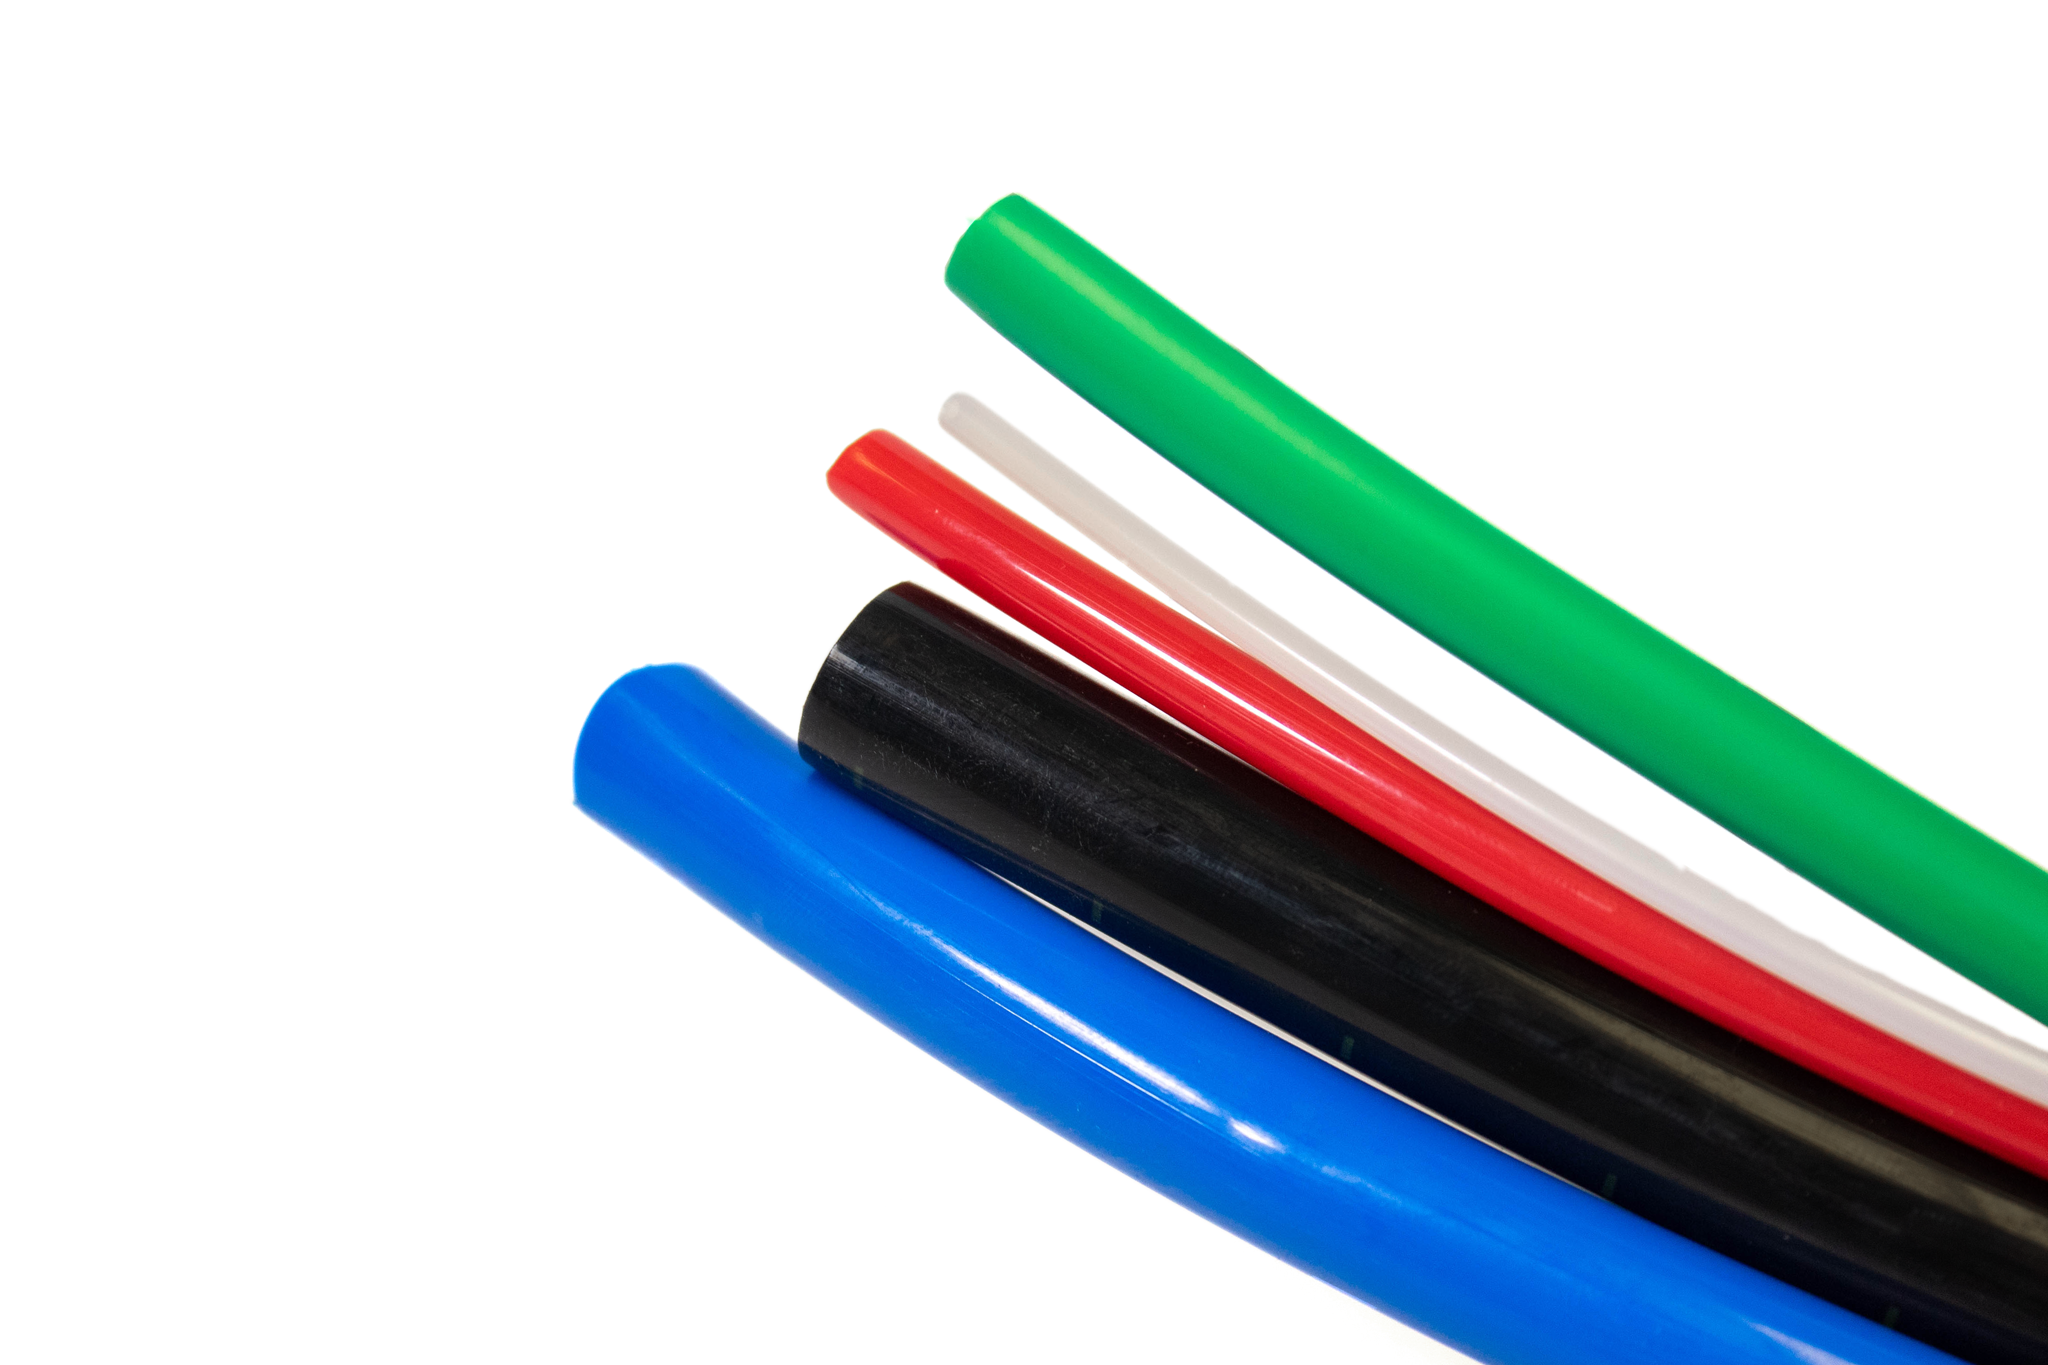 Flexible Nylon Hose Tubing Thick Wall 12.0mm O/D x 8.5mm I/D x 1.75mm Wall Red